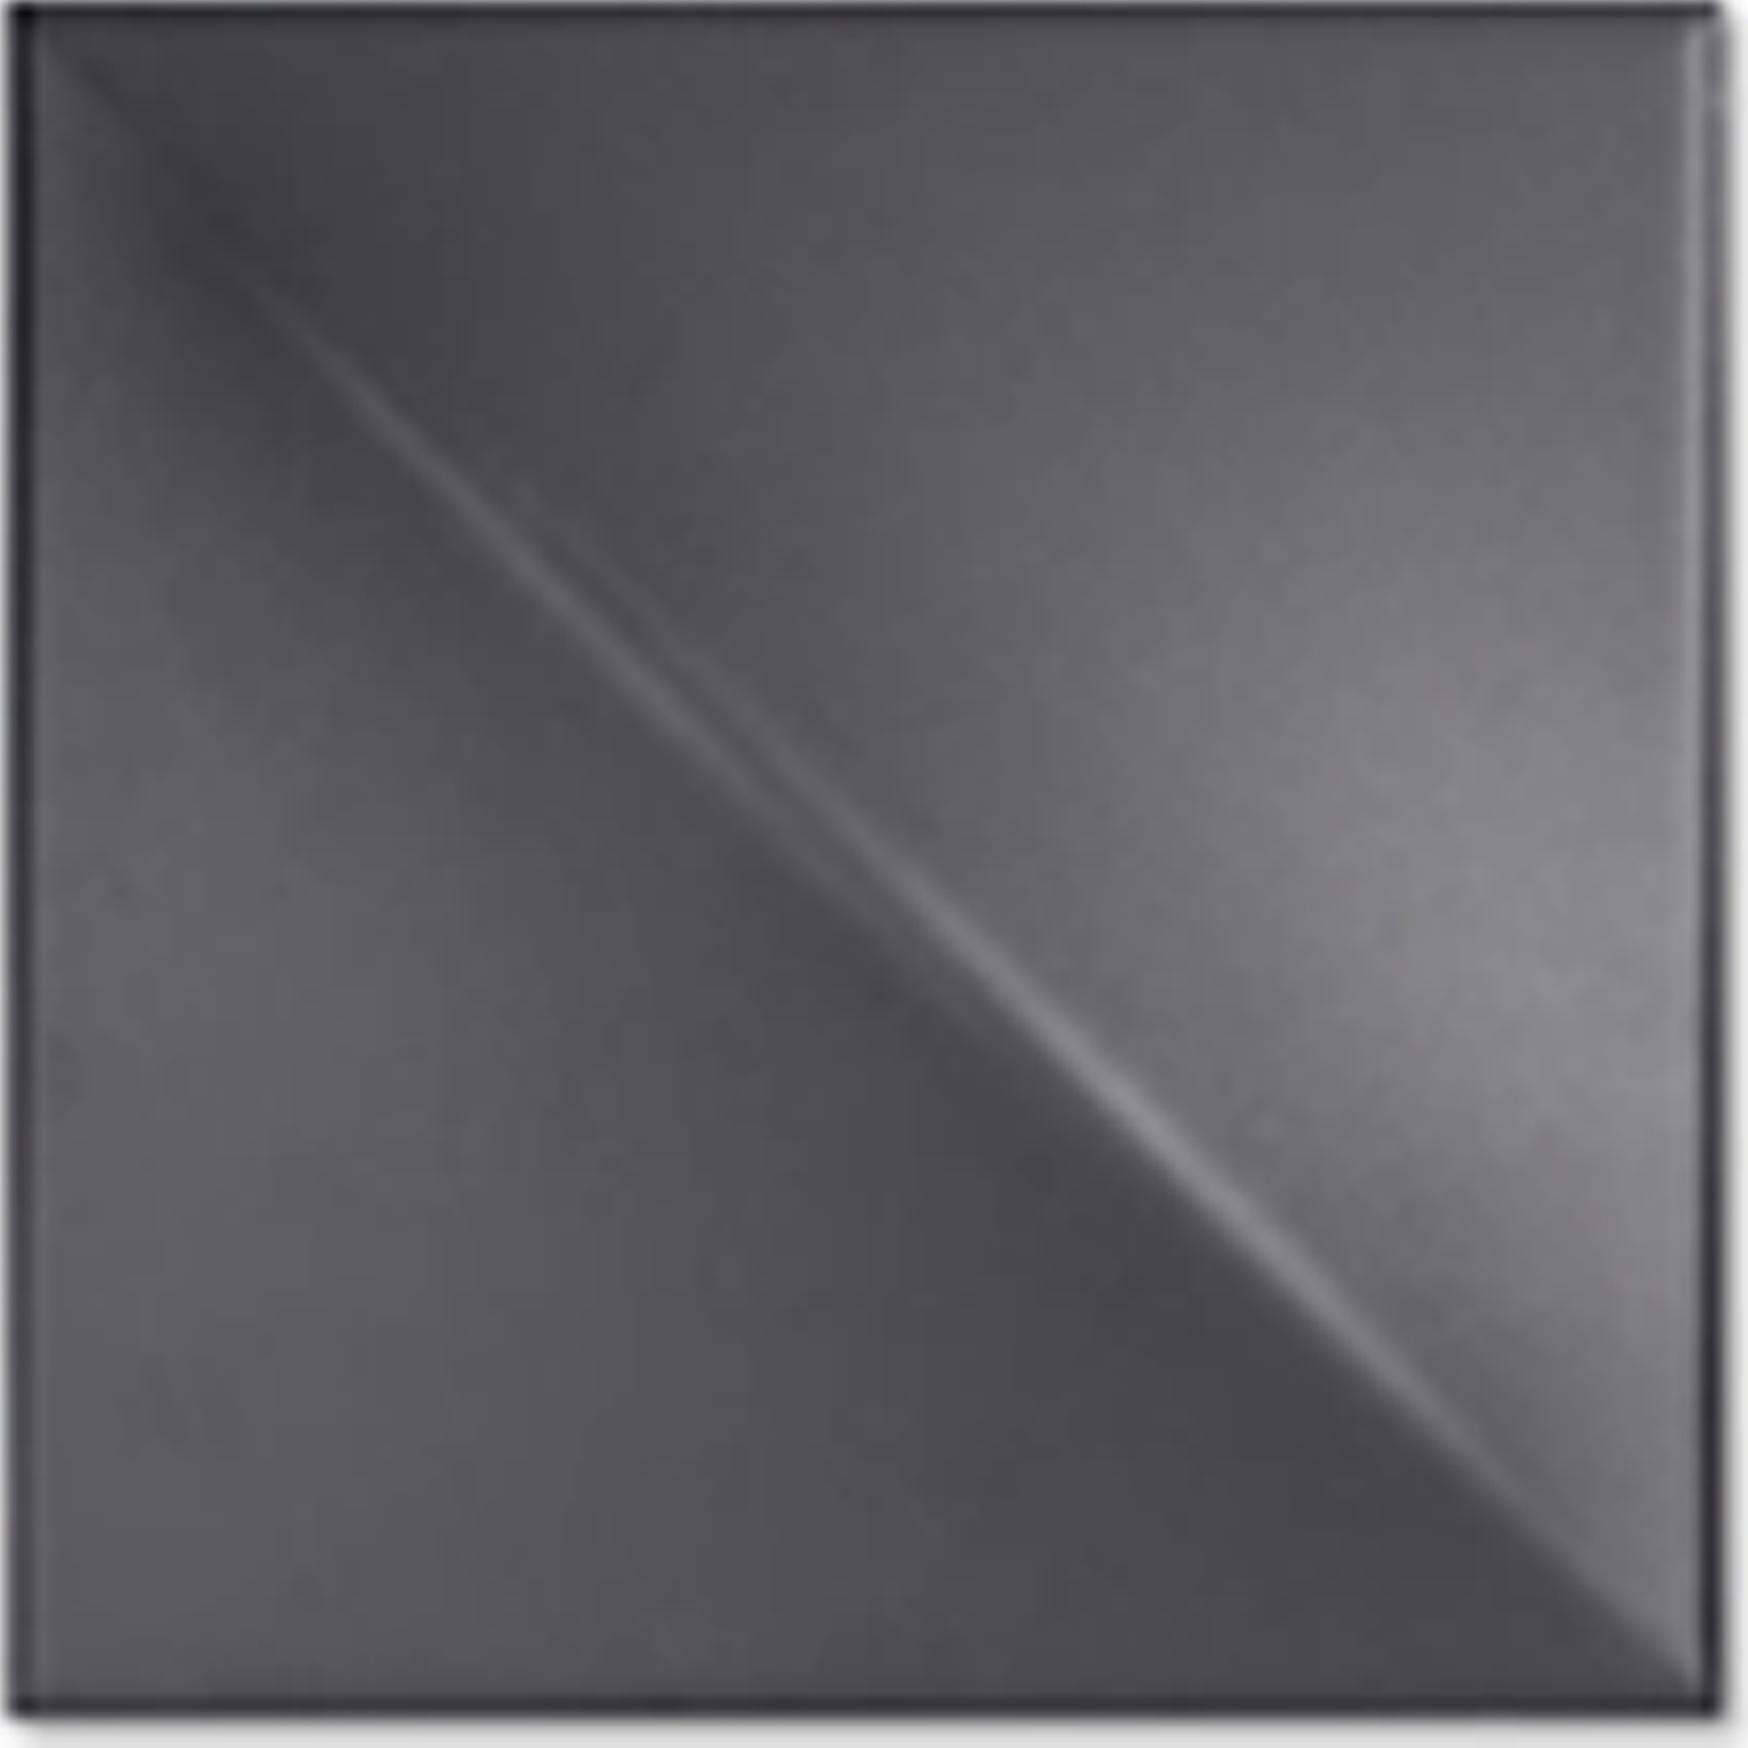 Slide Antracita 14.8x14.8 cm